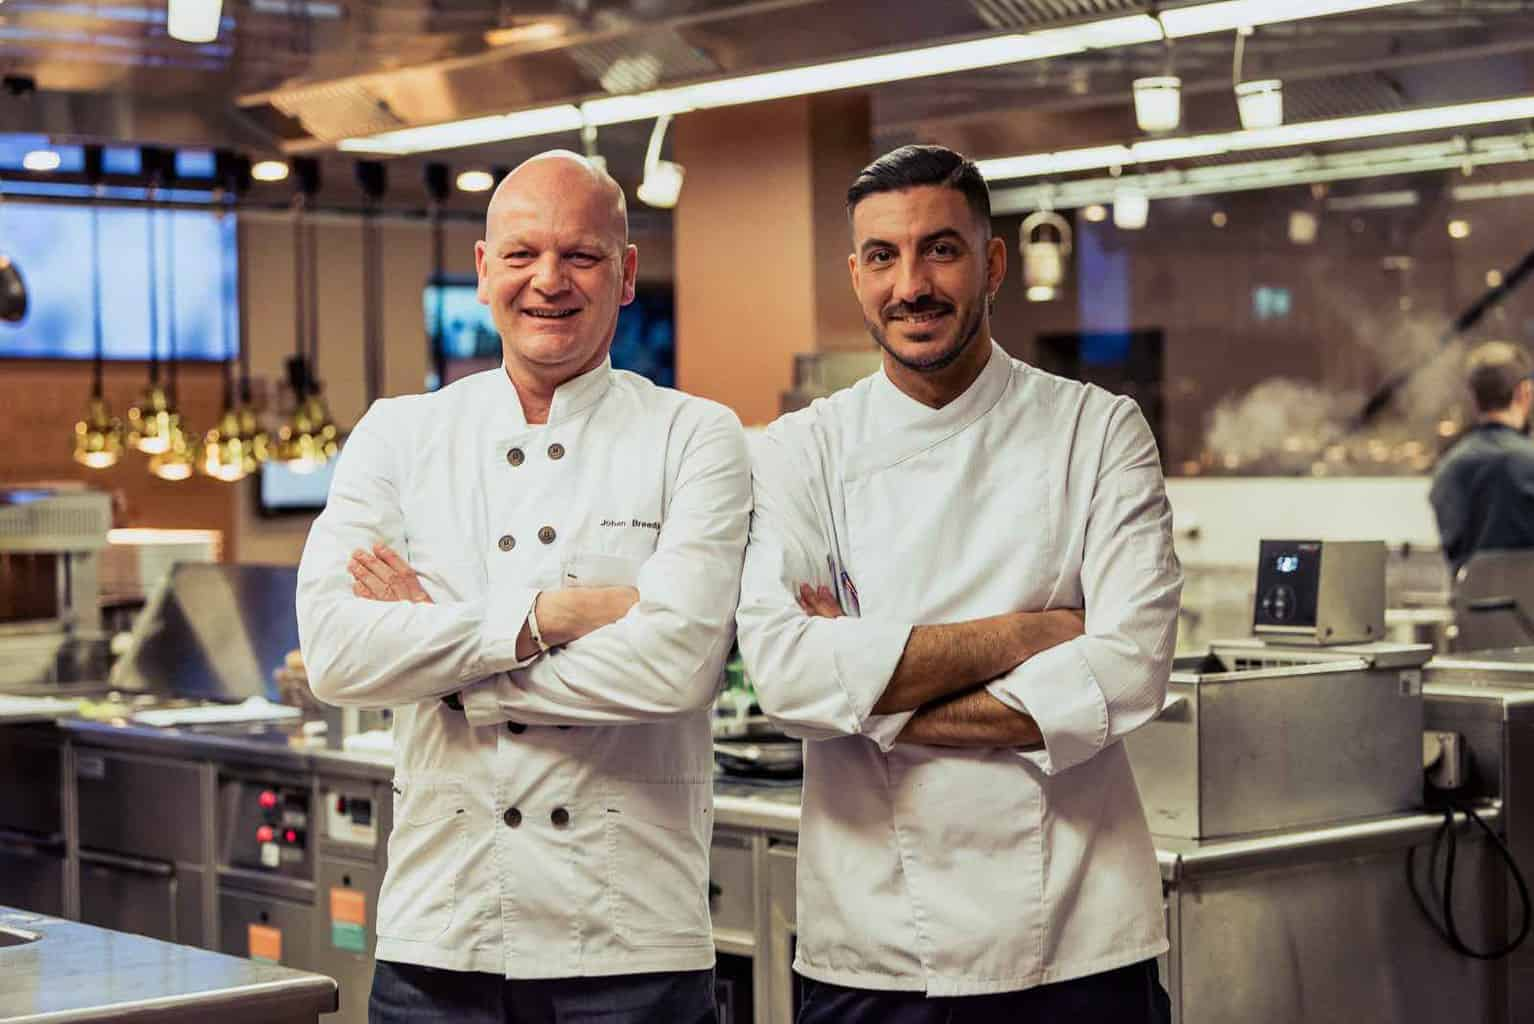 Chefs Rafa Martinez andJohan Breedijk